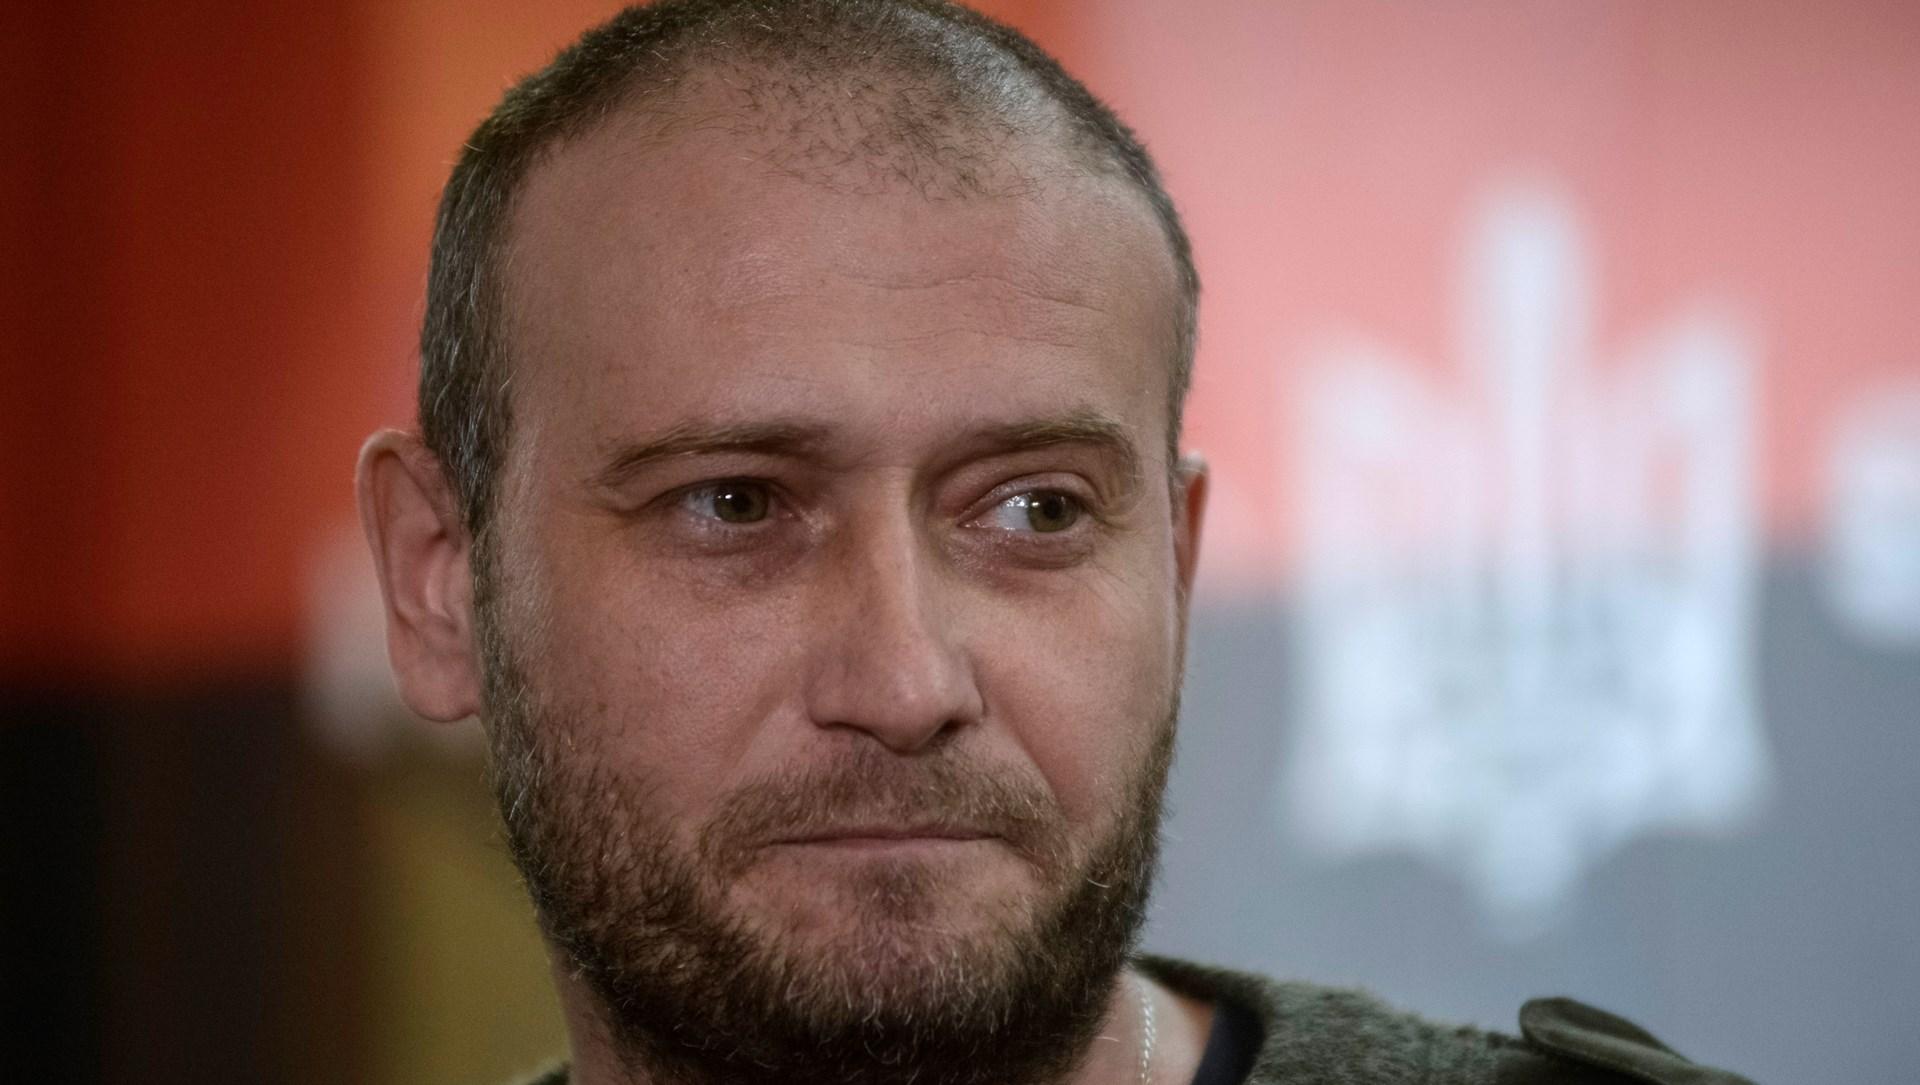 Прокуроры до сих пор не допросили Яроша по делу Майдана. Видео